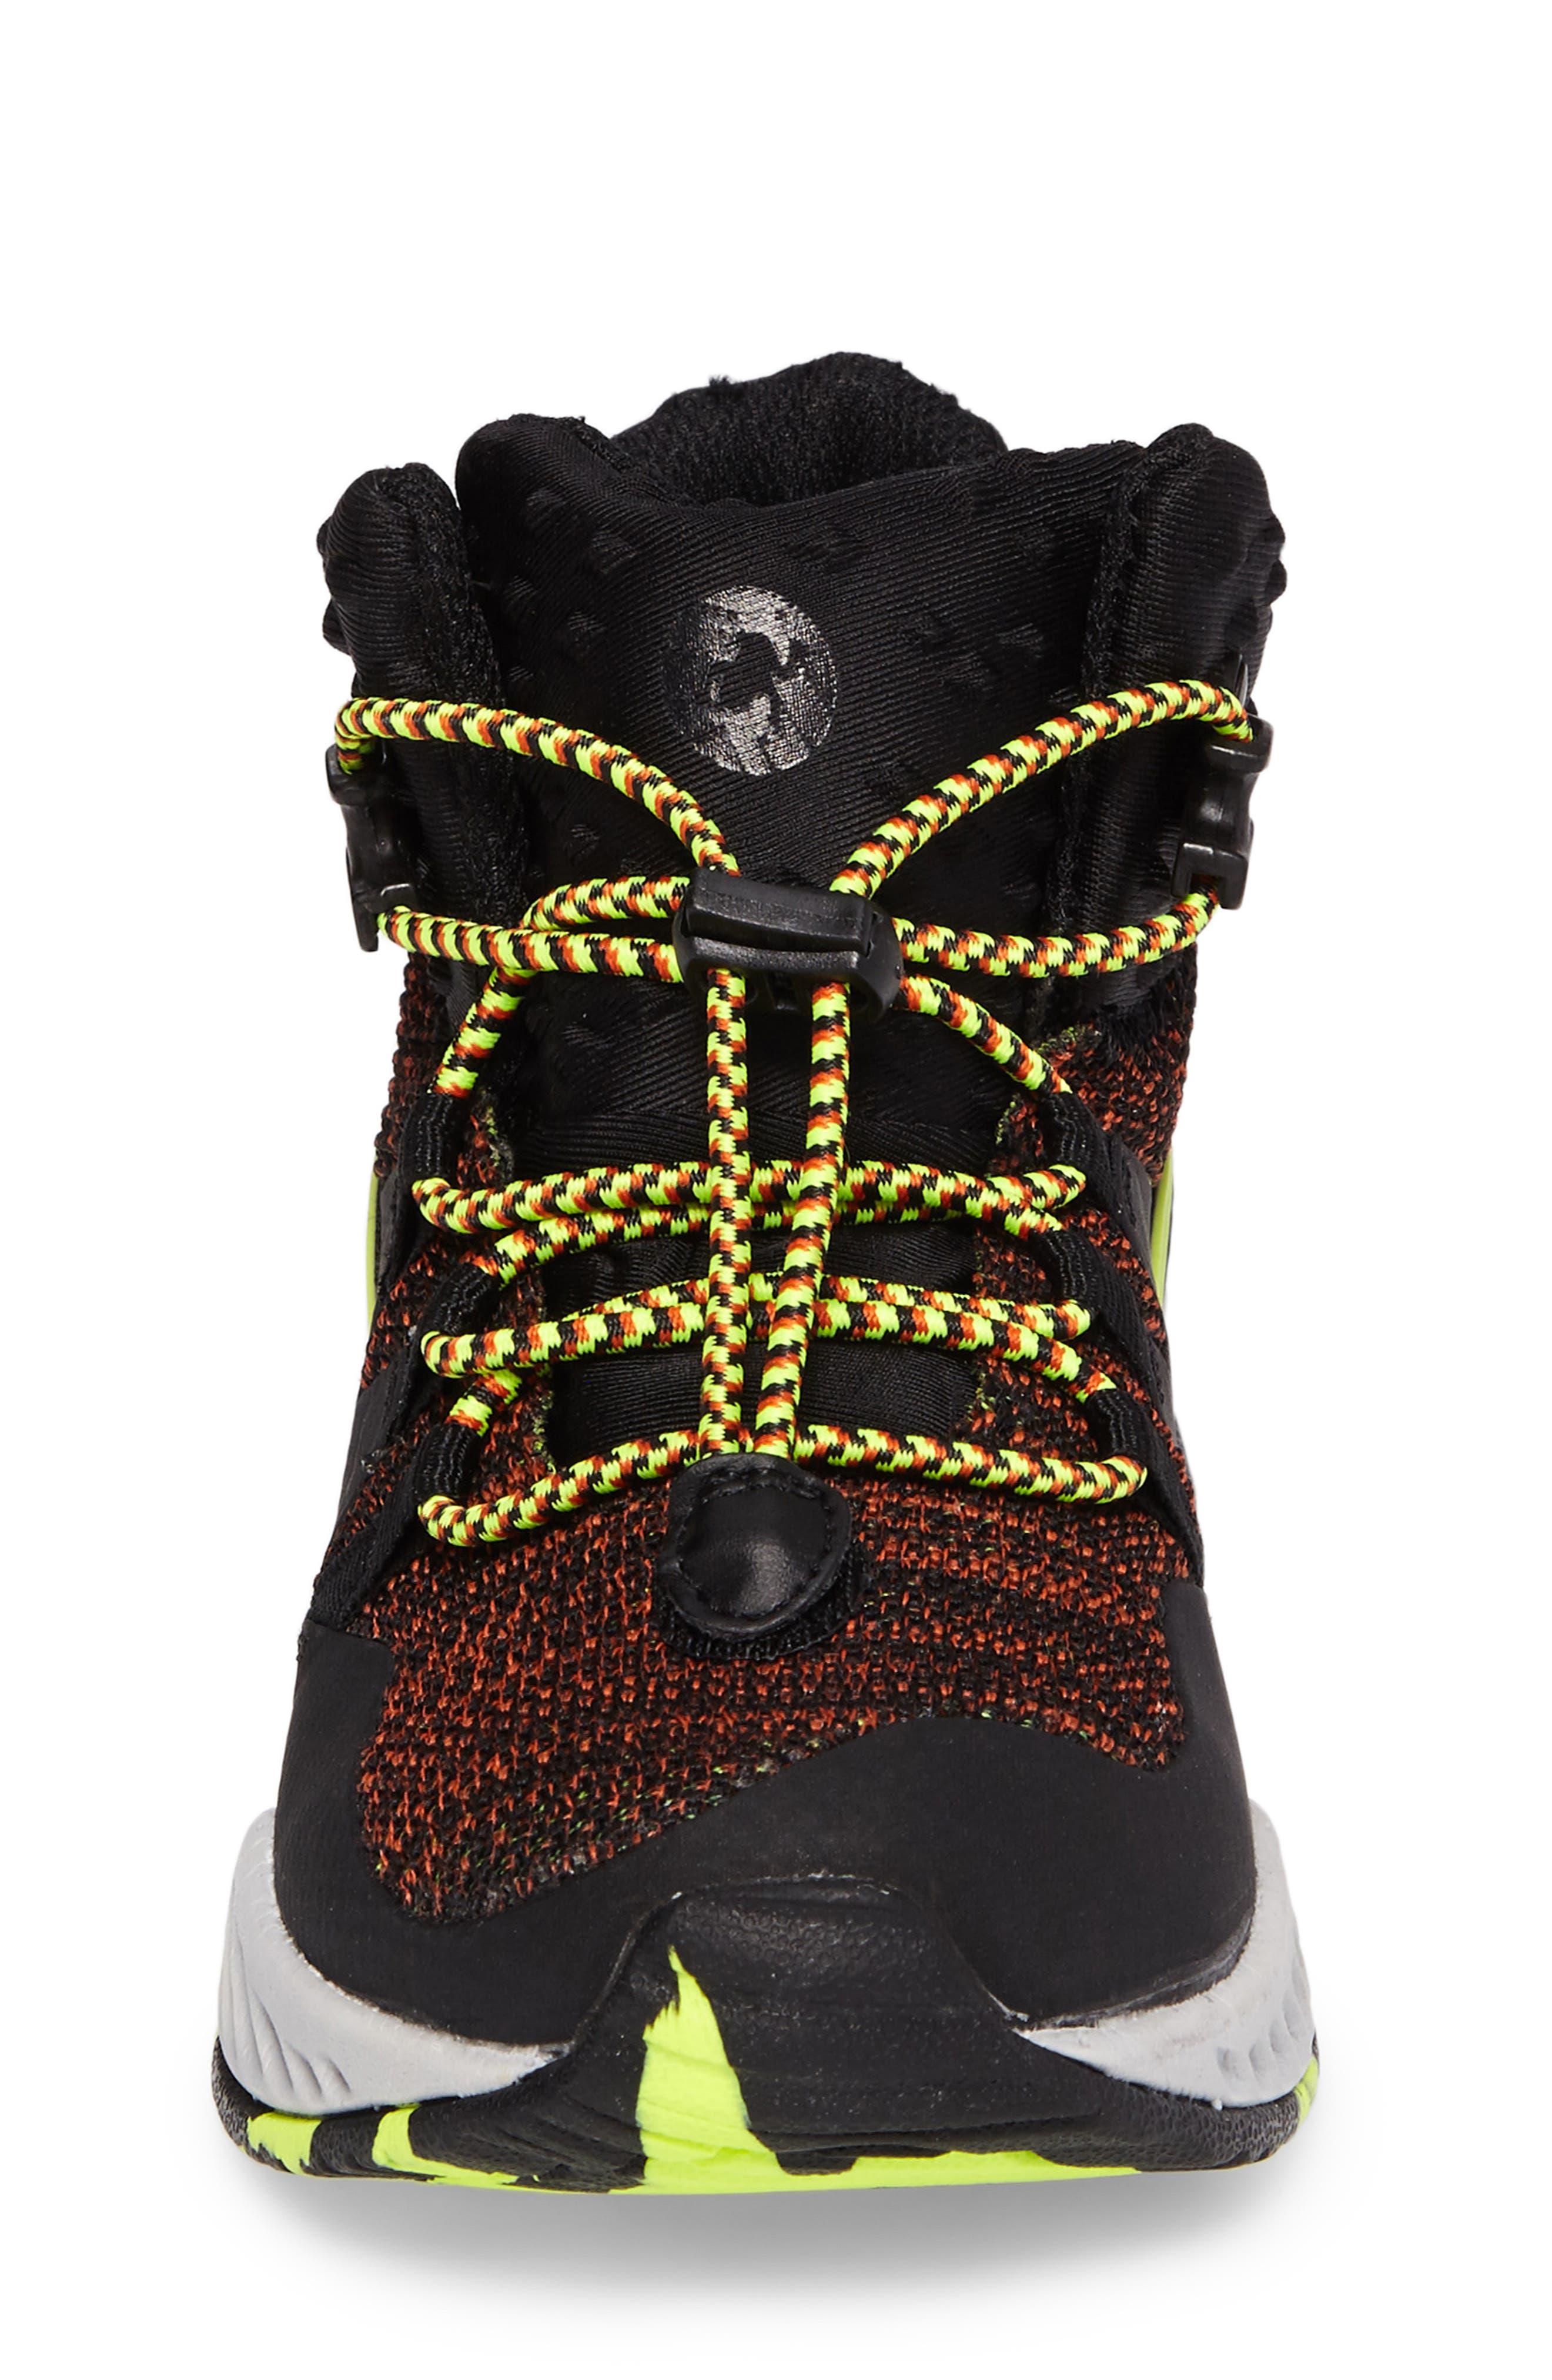 Armadillo Sneaker Boot,                             Alternate thumbnail 4, color,                             001